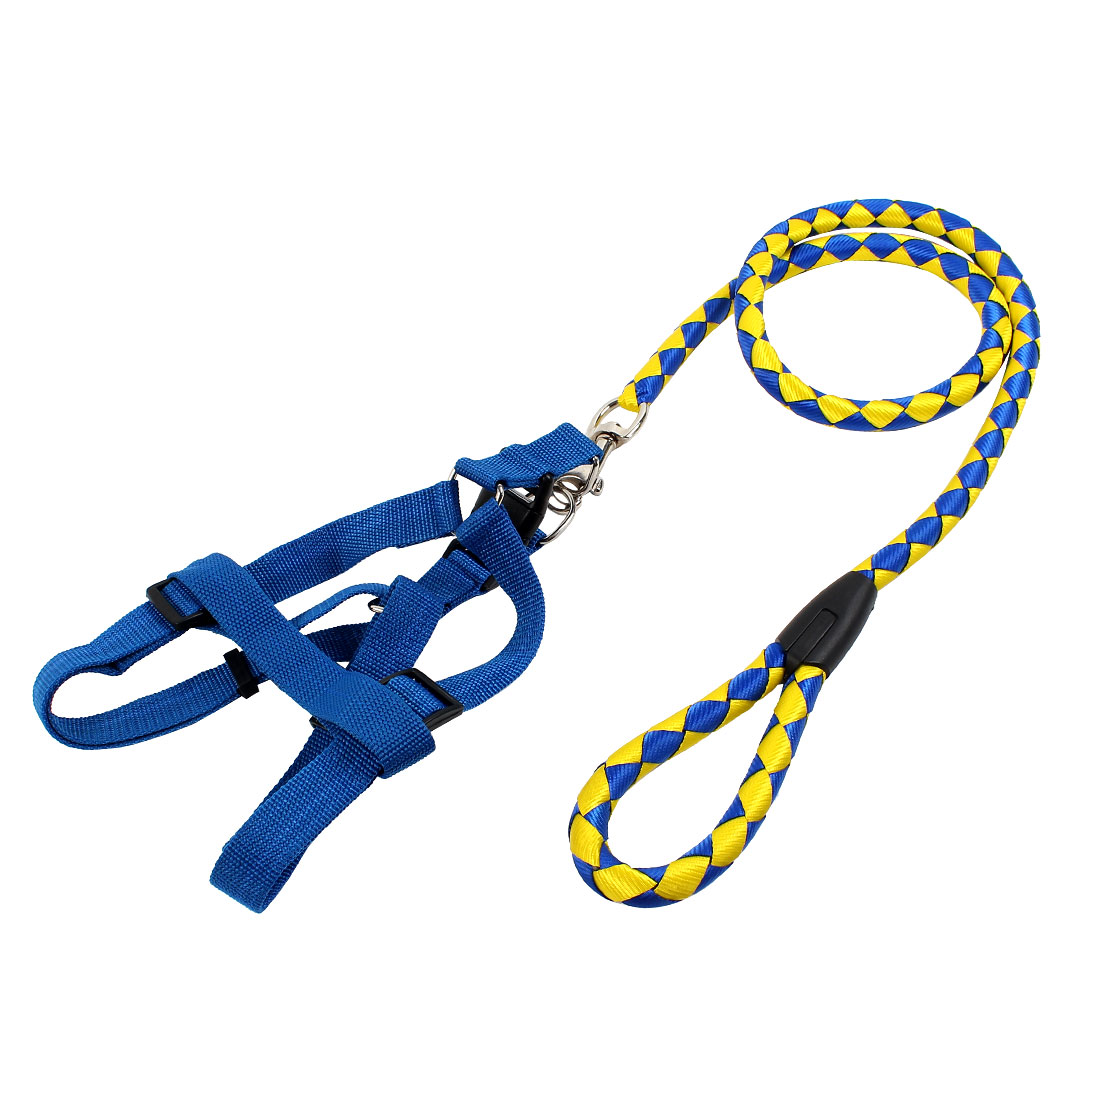 Pet Dog Doggie Nylon Rope Lead Adjustable Harness Leash Collar Blue Yellow